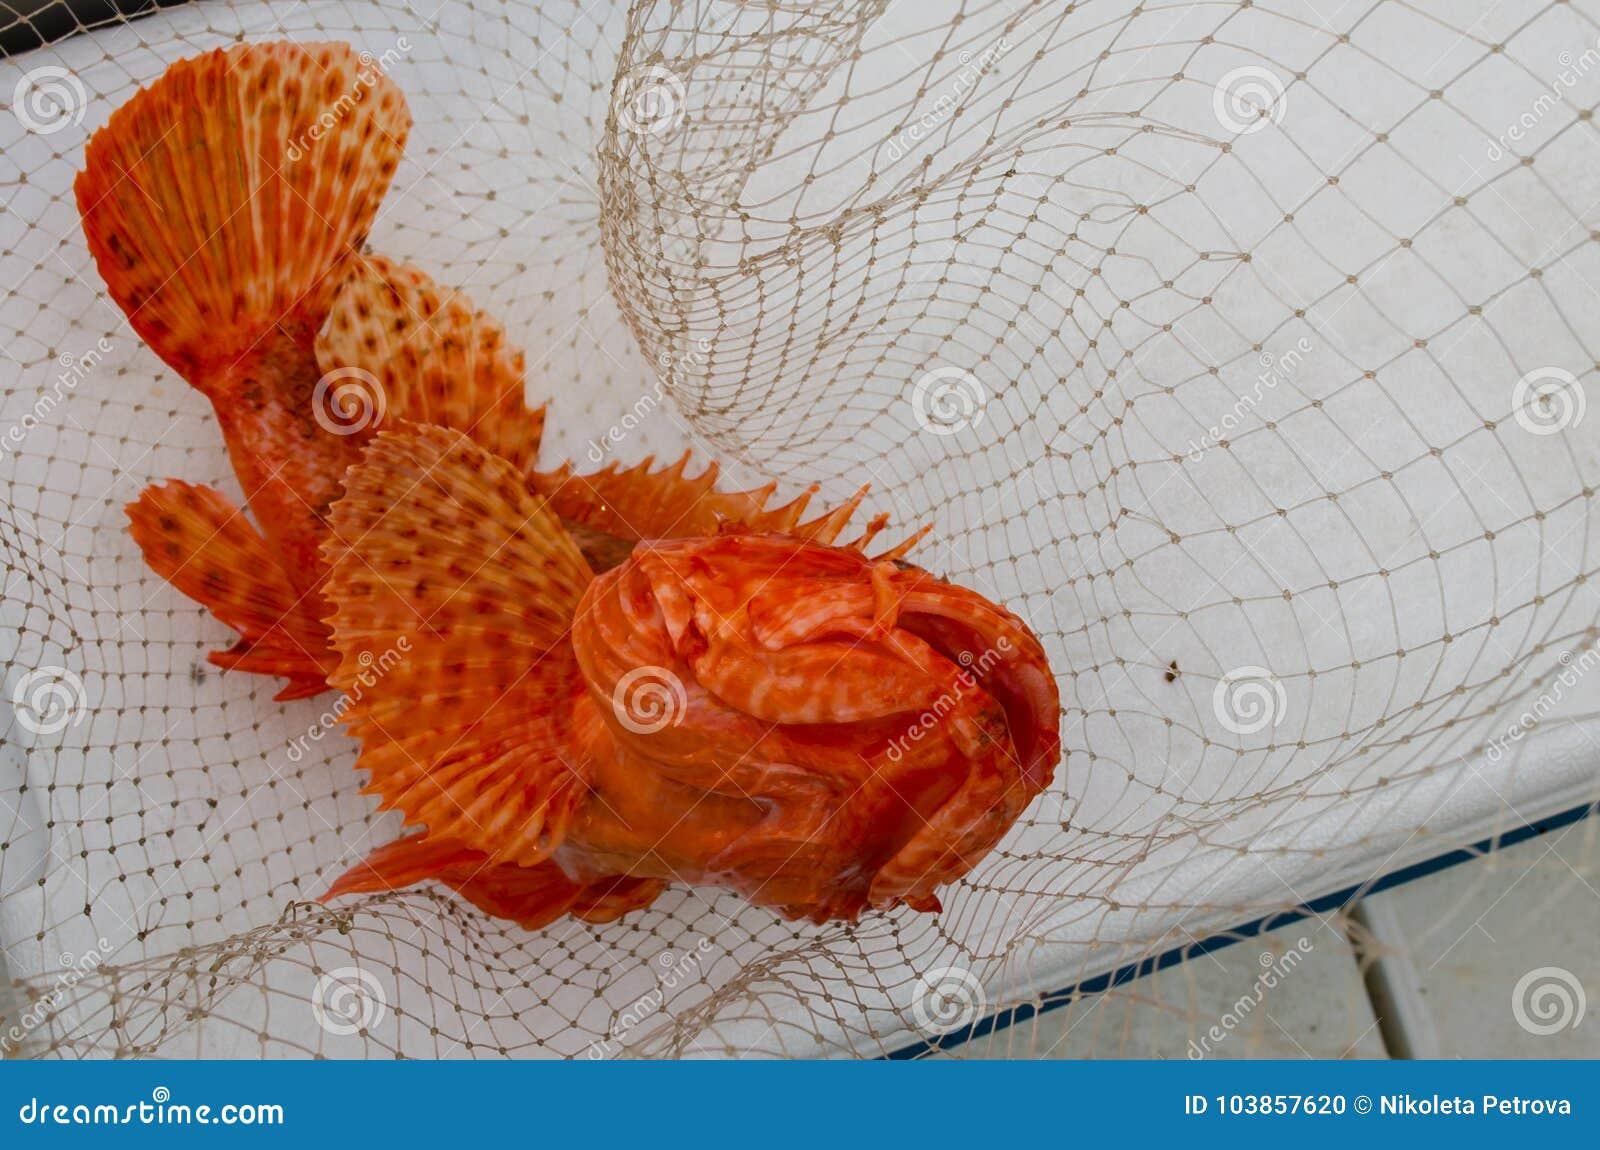 Colorful Orange Scorpaenidae Fish Caught Stock Photo - Image of ...